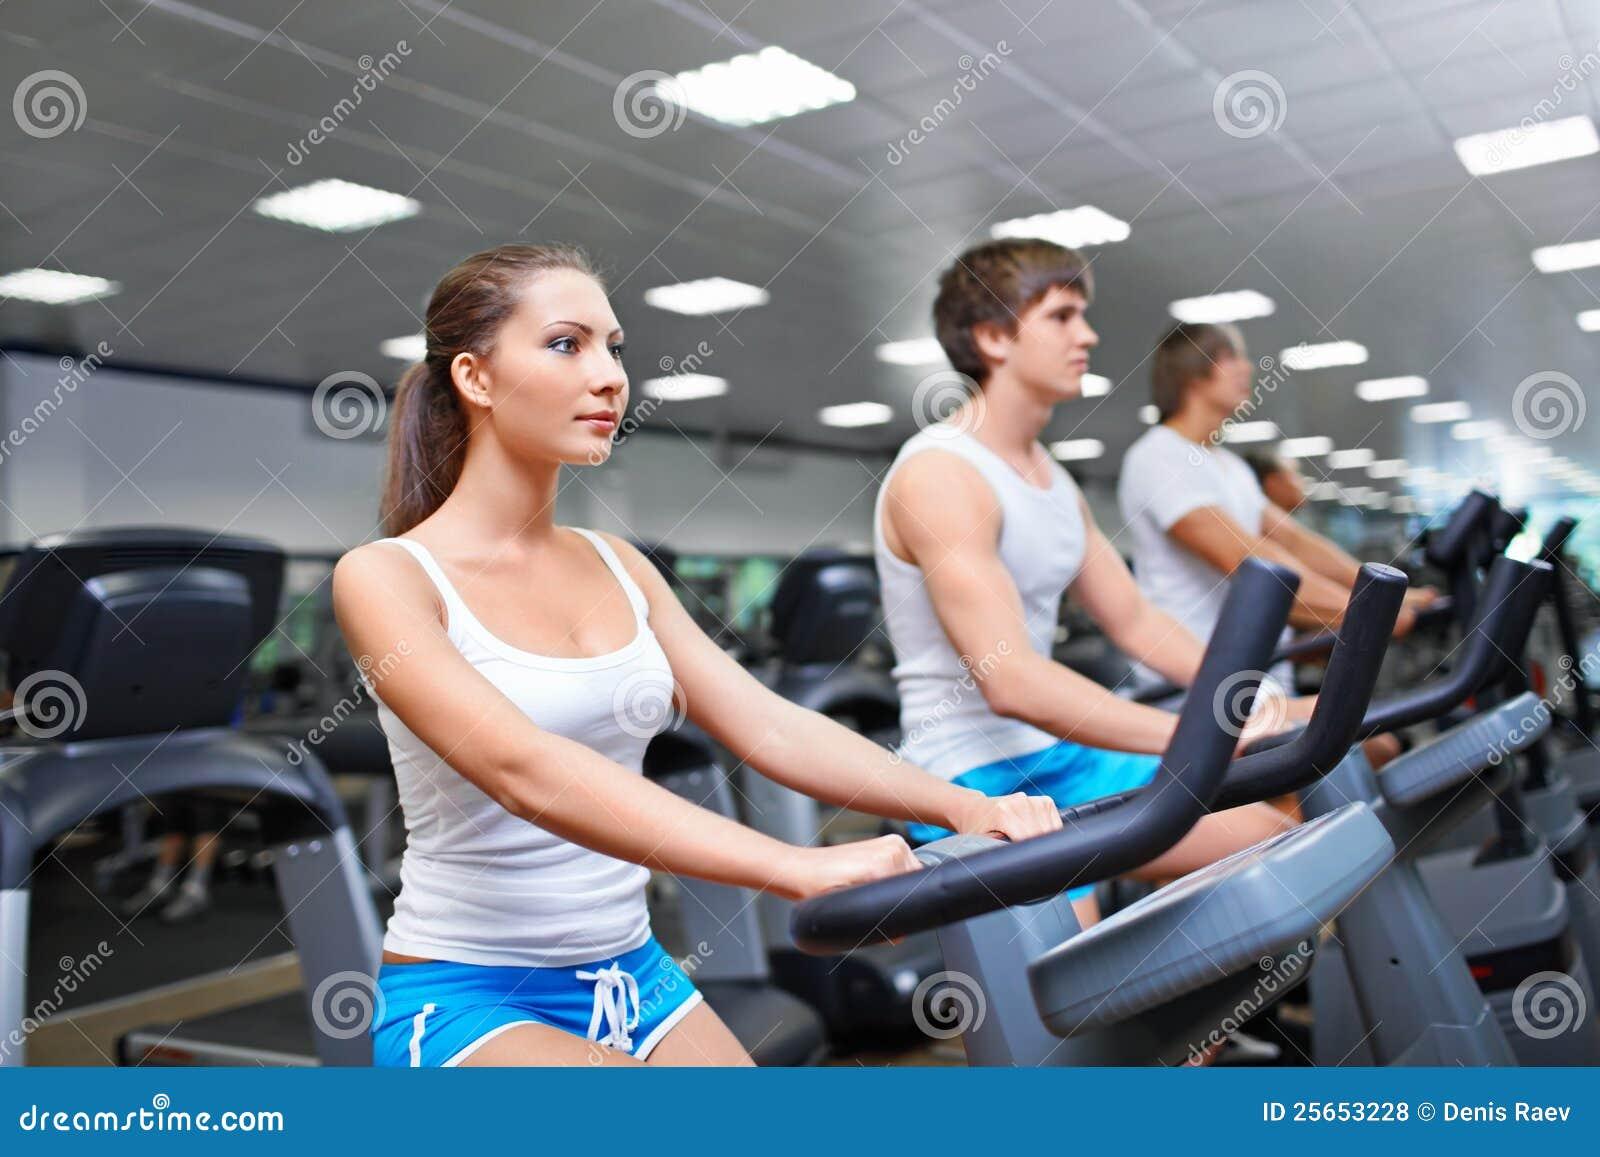 Fitness club stock photo. Image of male, body, caucasian ...